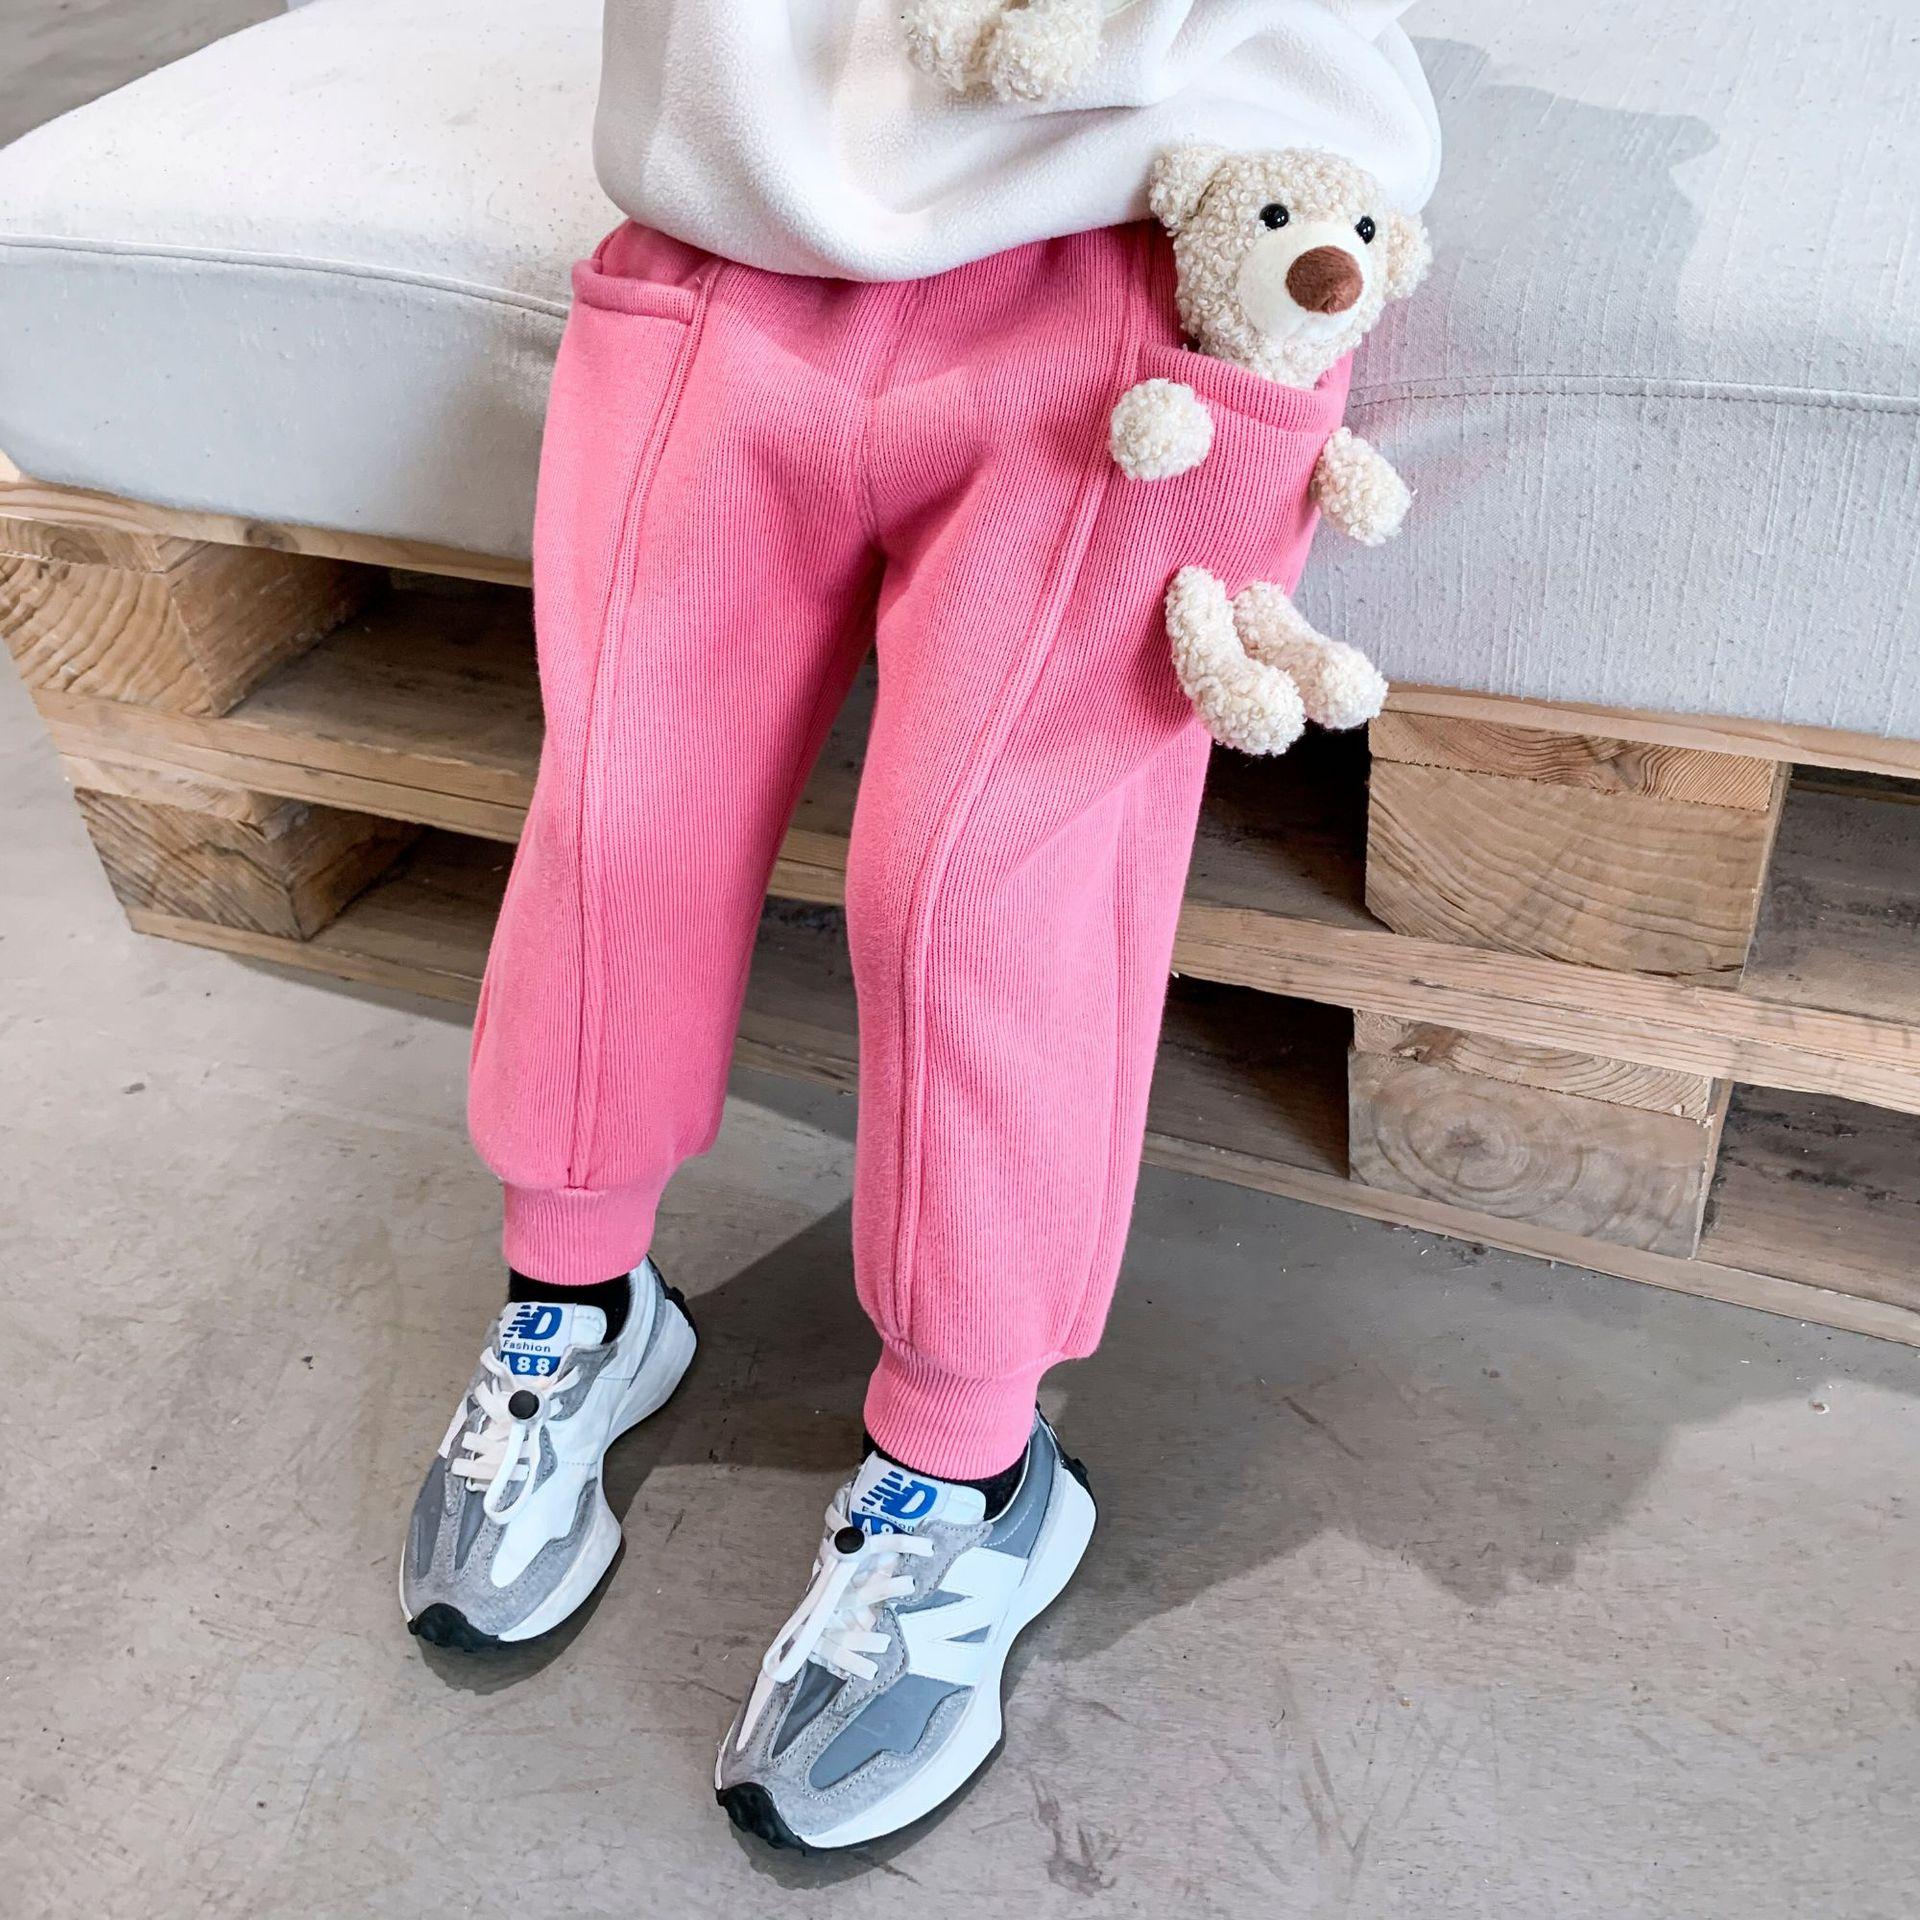 2021 Autumn Winter New Arrival Boys and Girls Cartoon Bear Pants Kids Warm Fleece Trousers 2